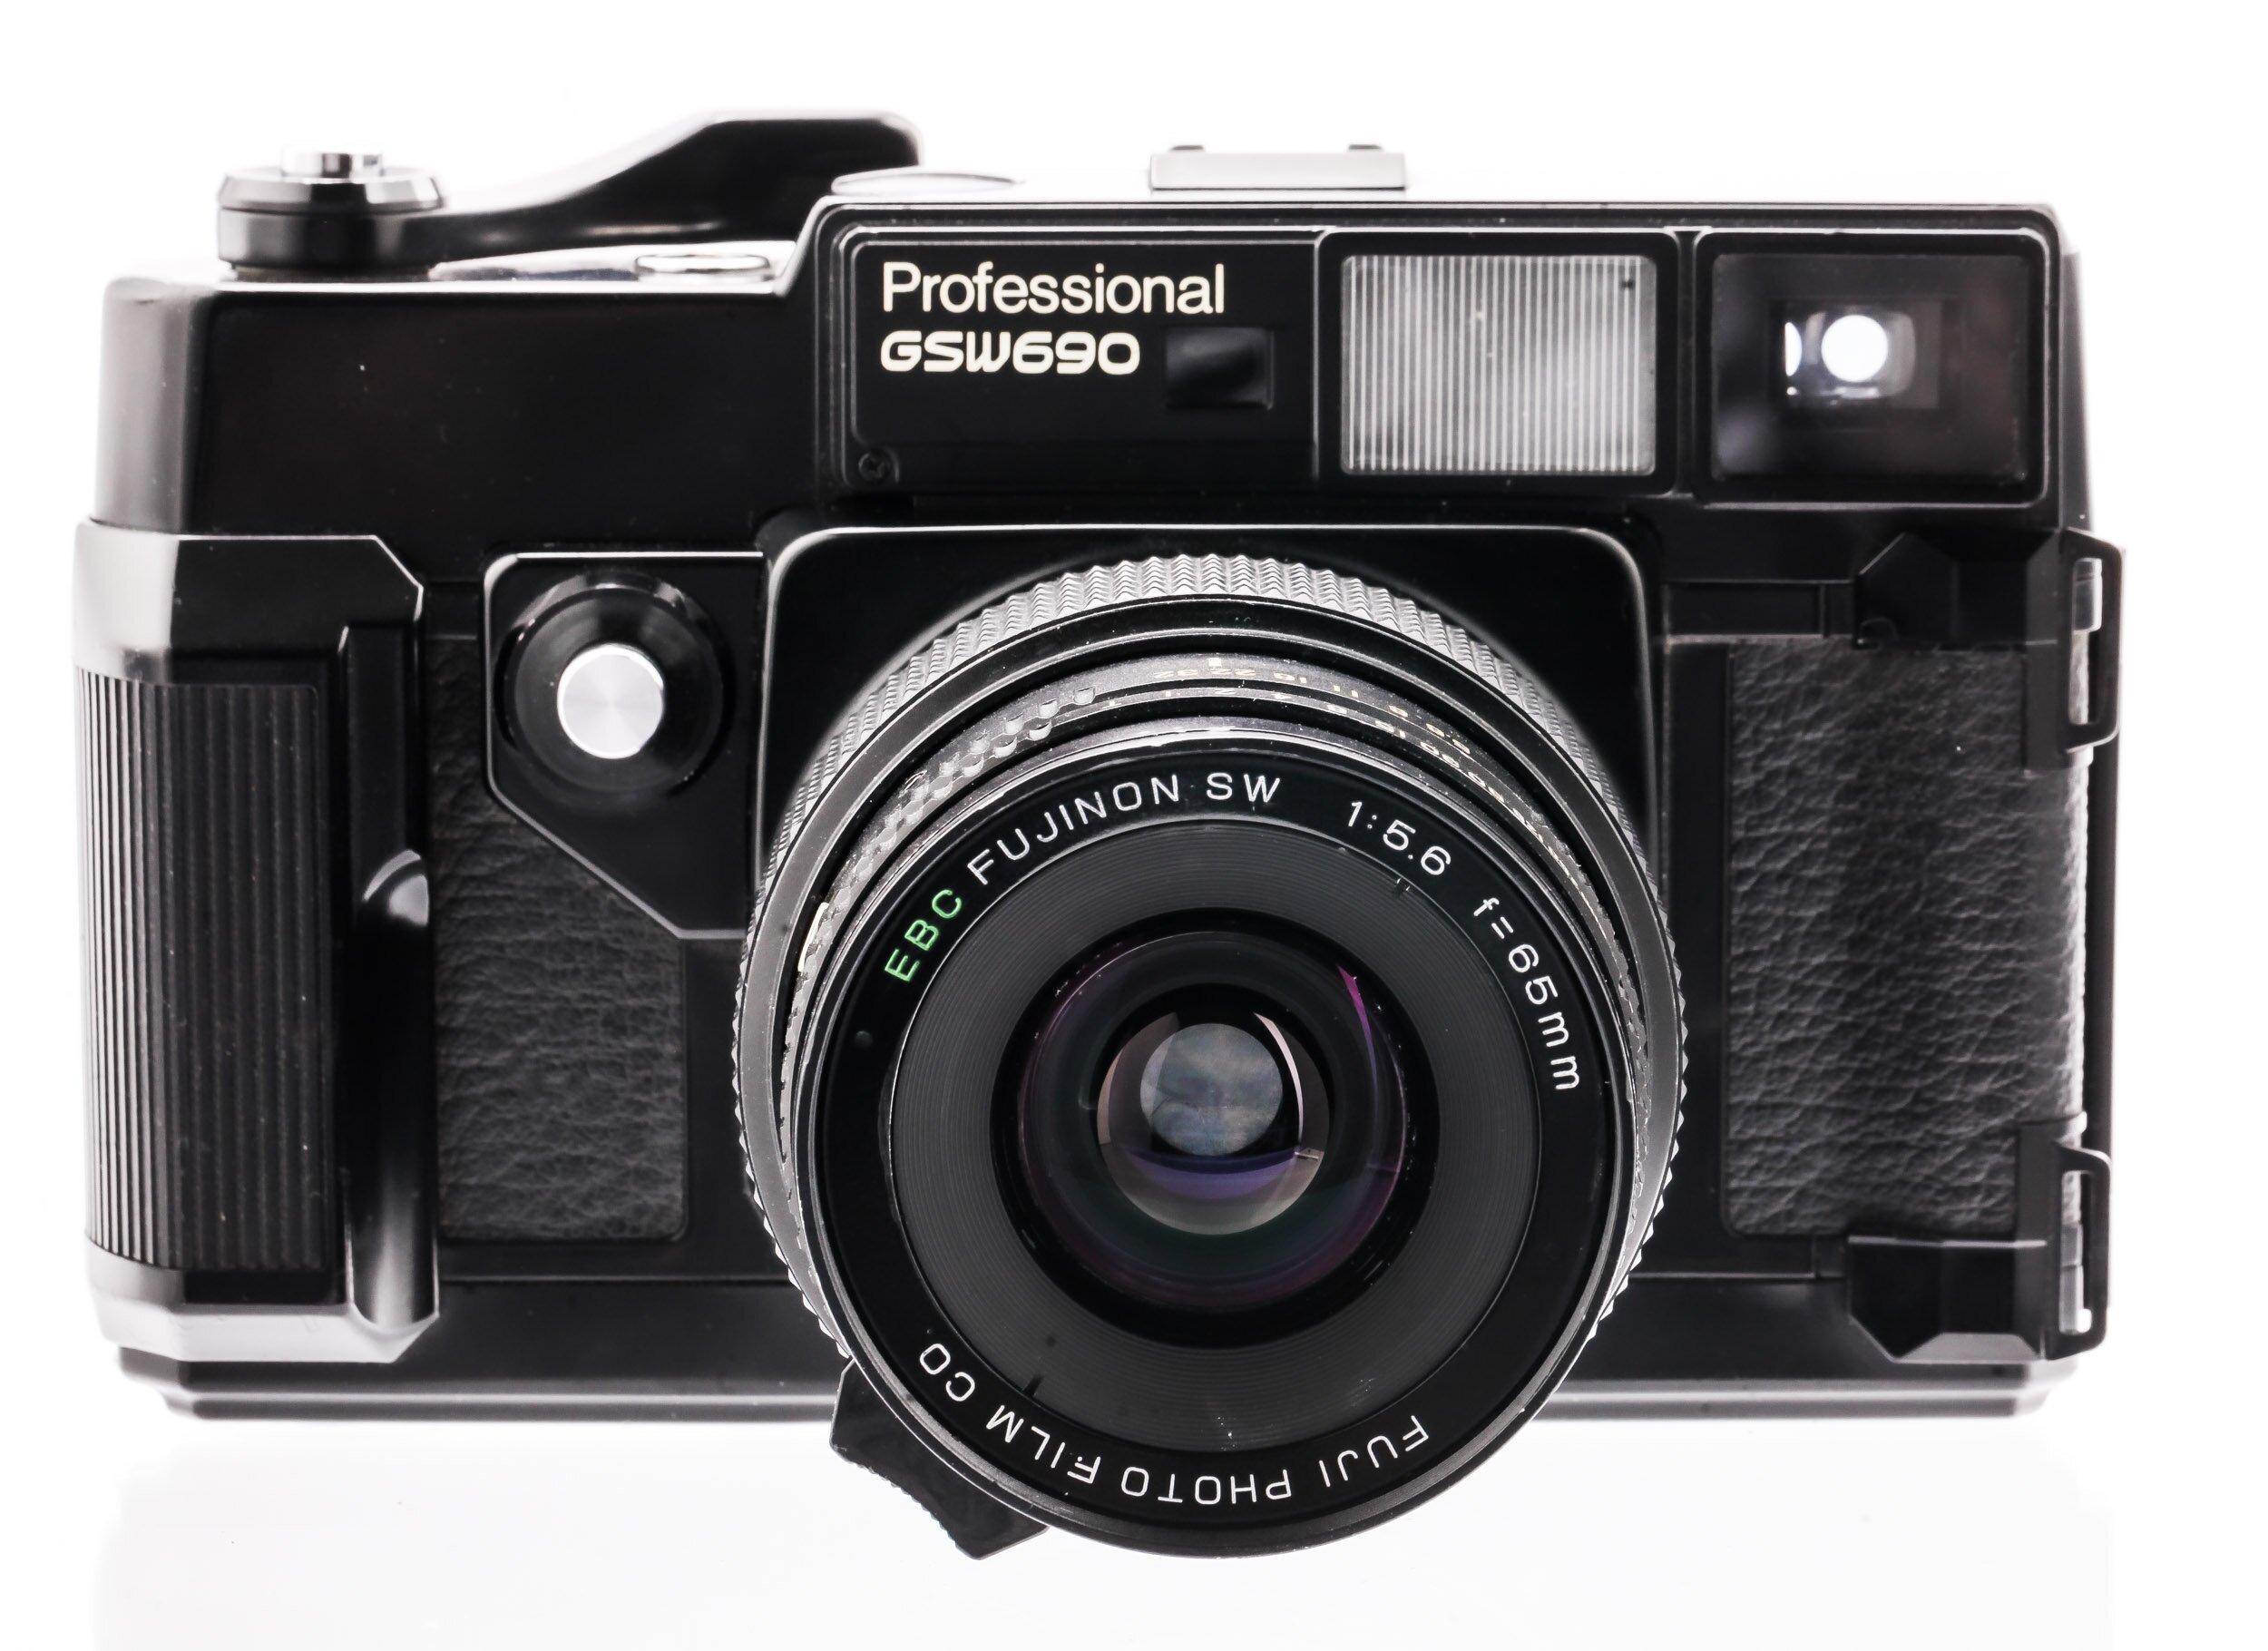 Fuji Professional GSW690